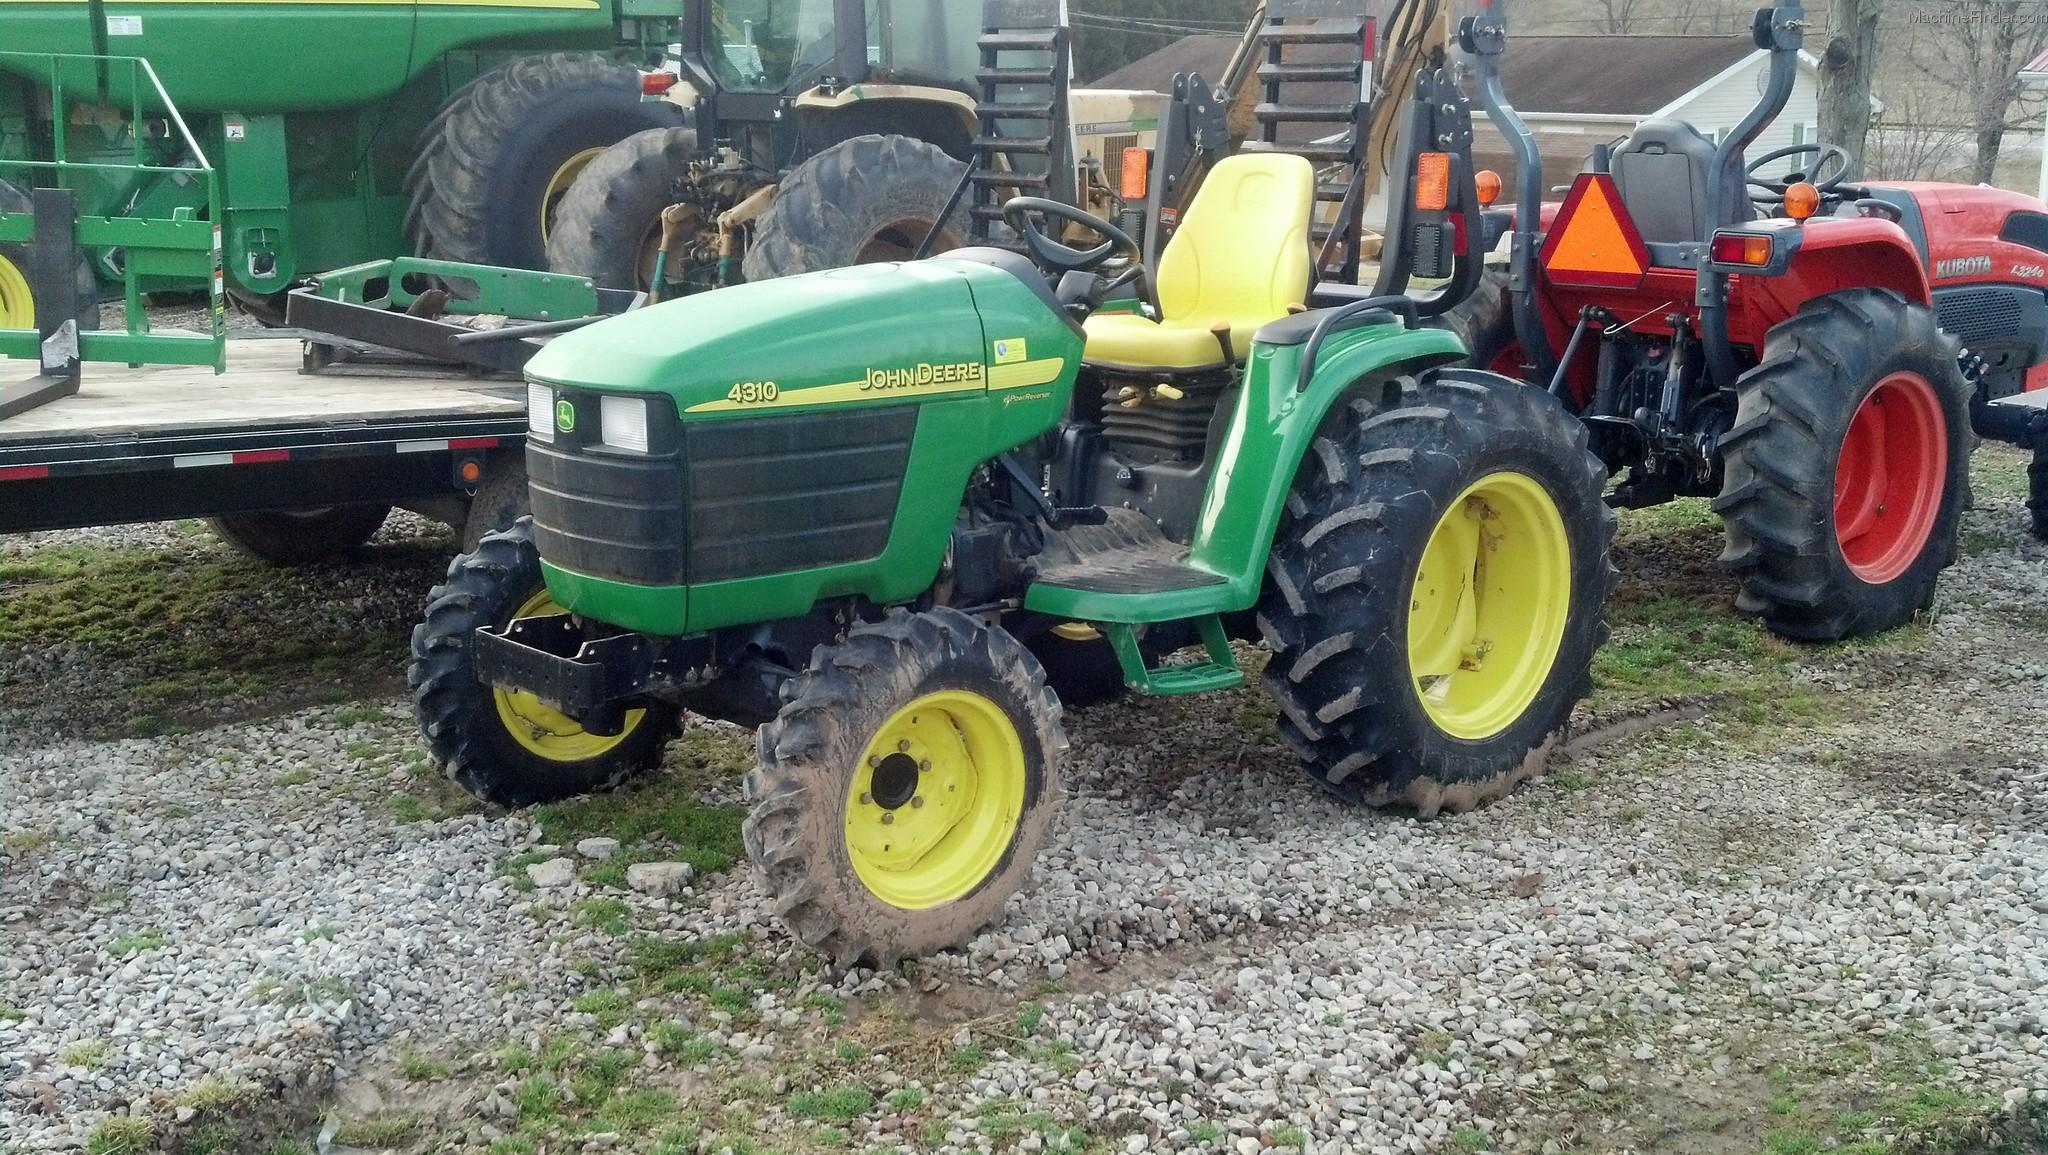 2004 John Deere 4310 Tractors - Compact (1-40hp.) - John ...